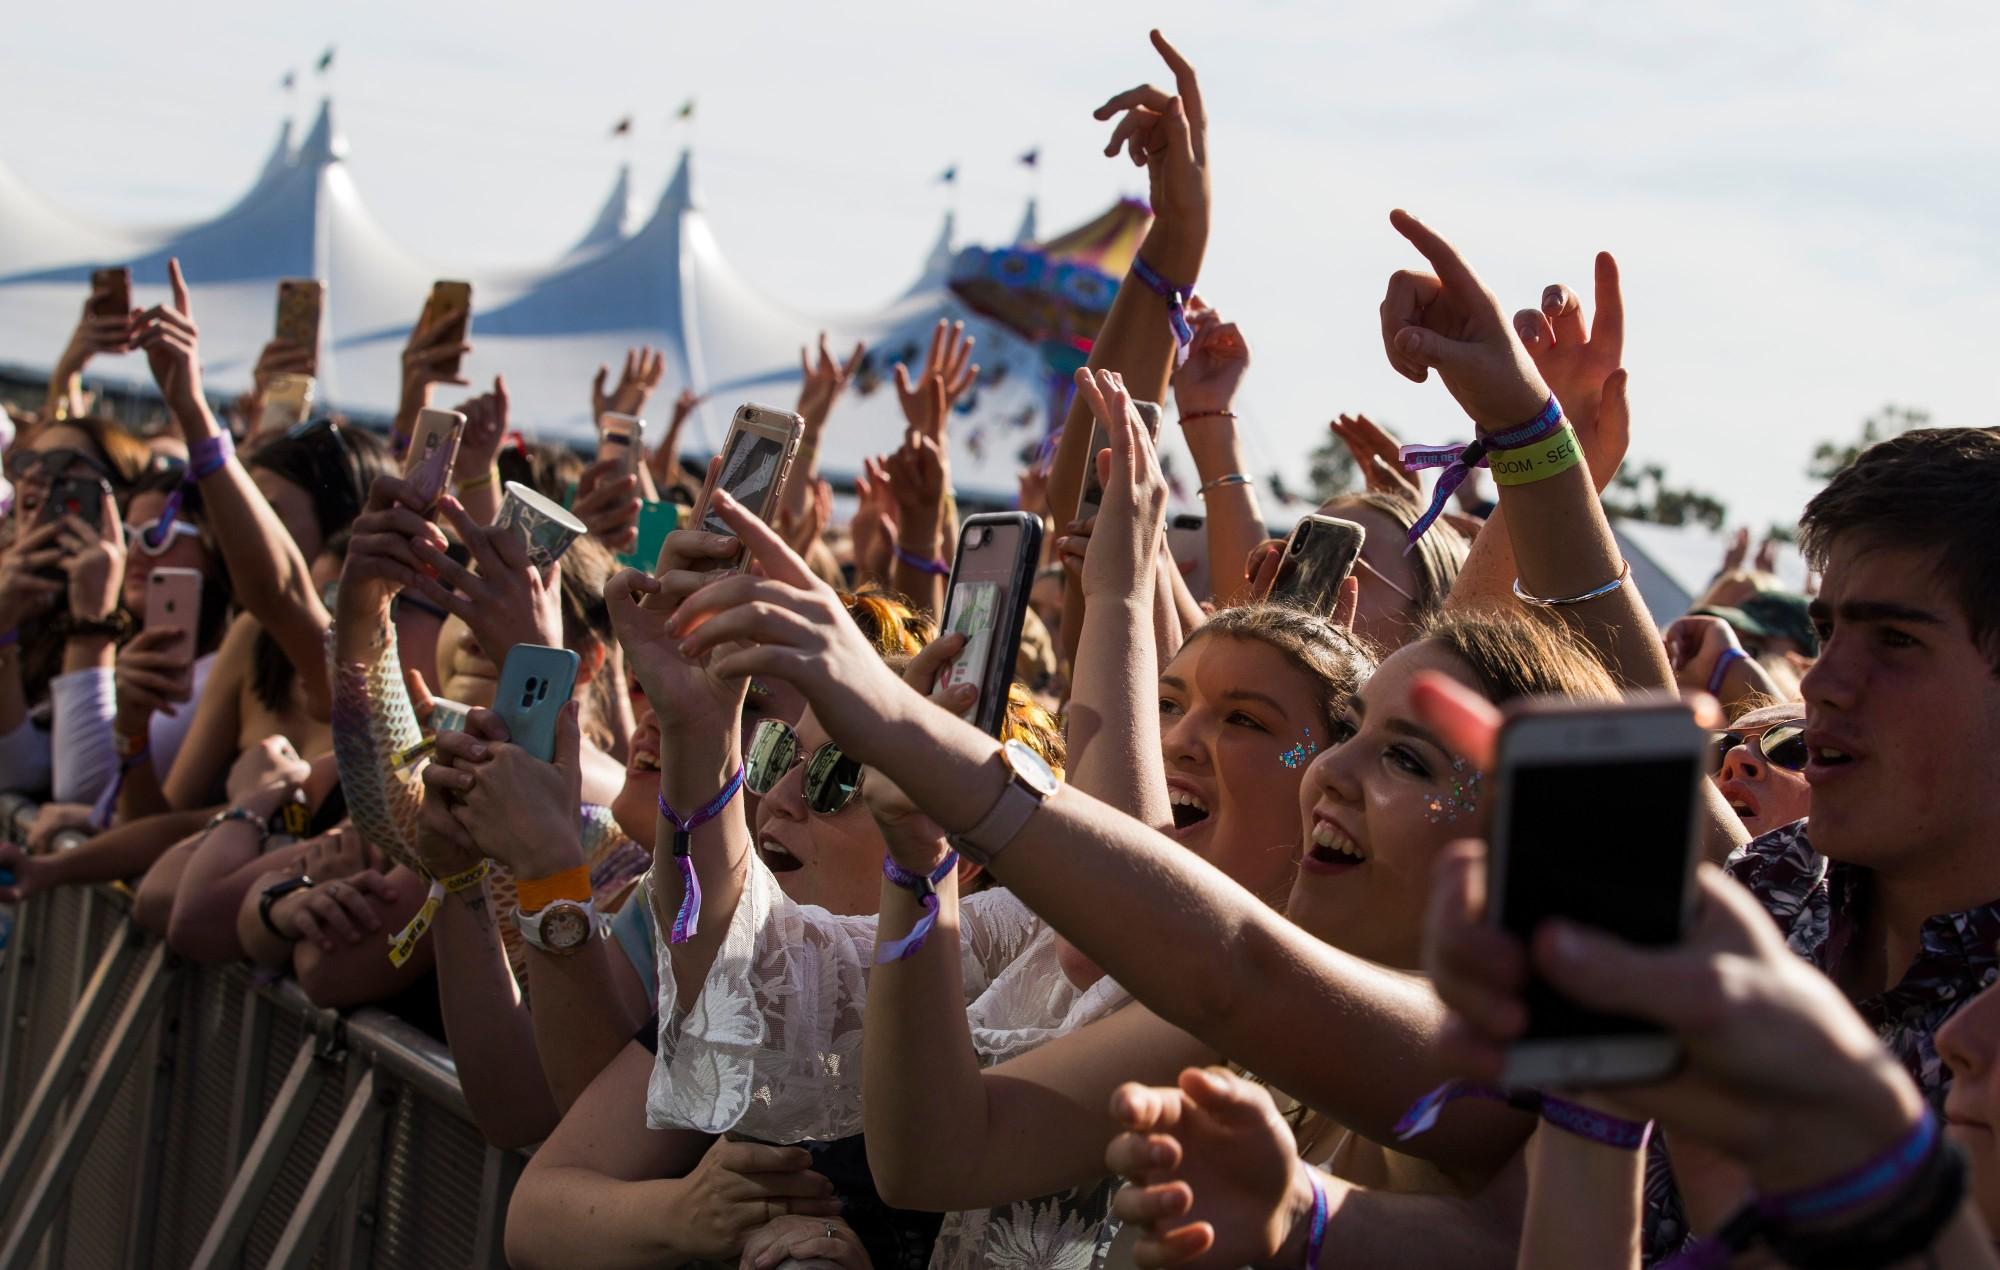 #SaveOurSummer 2021 report back to restart stay music trade